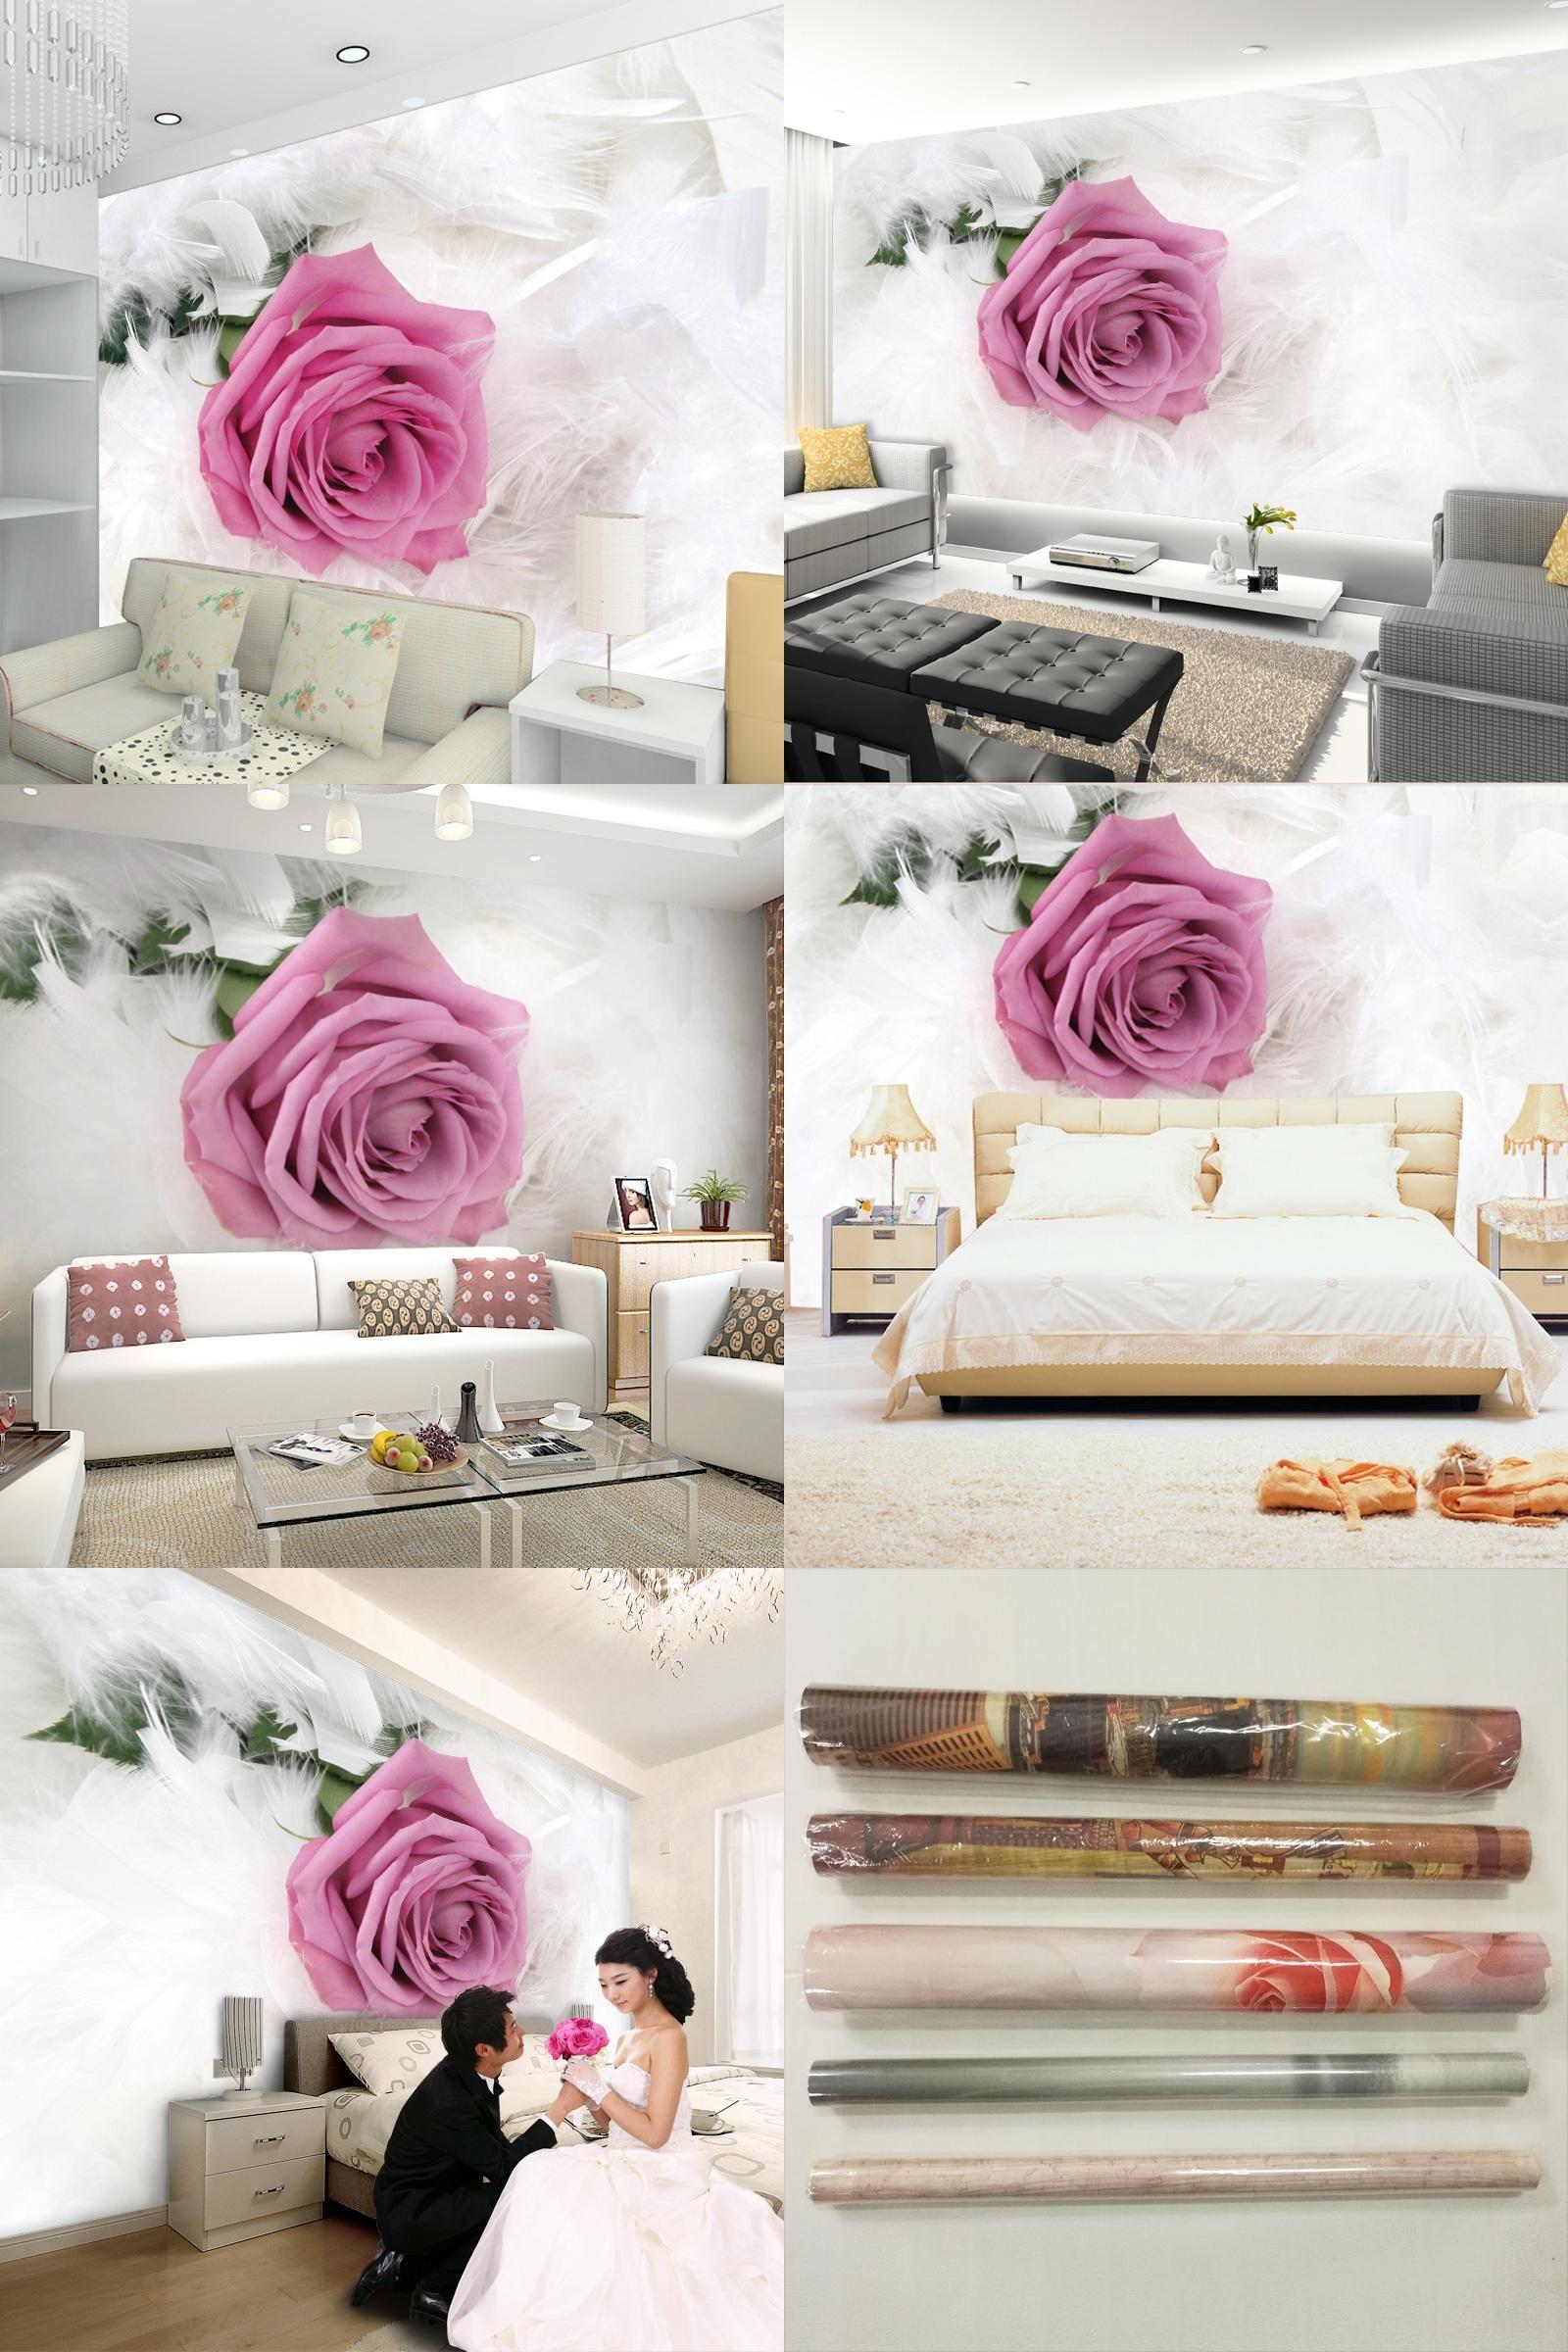 Large papel de parede decorative 3d wall panels murals wallpaper for -  Visit To Buy Custom 3d Photo Wallpaper Rose Flower Tv Background Large Mural Living